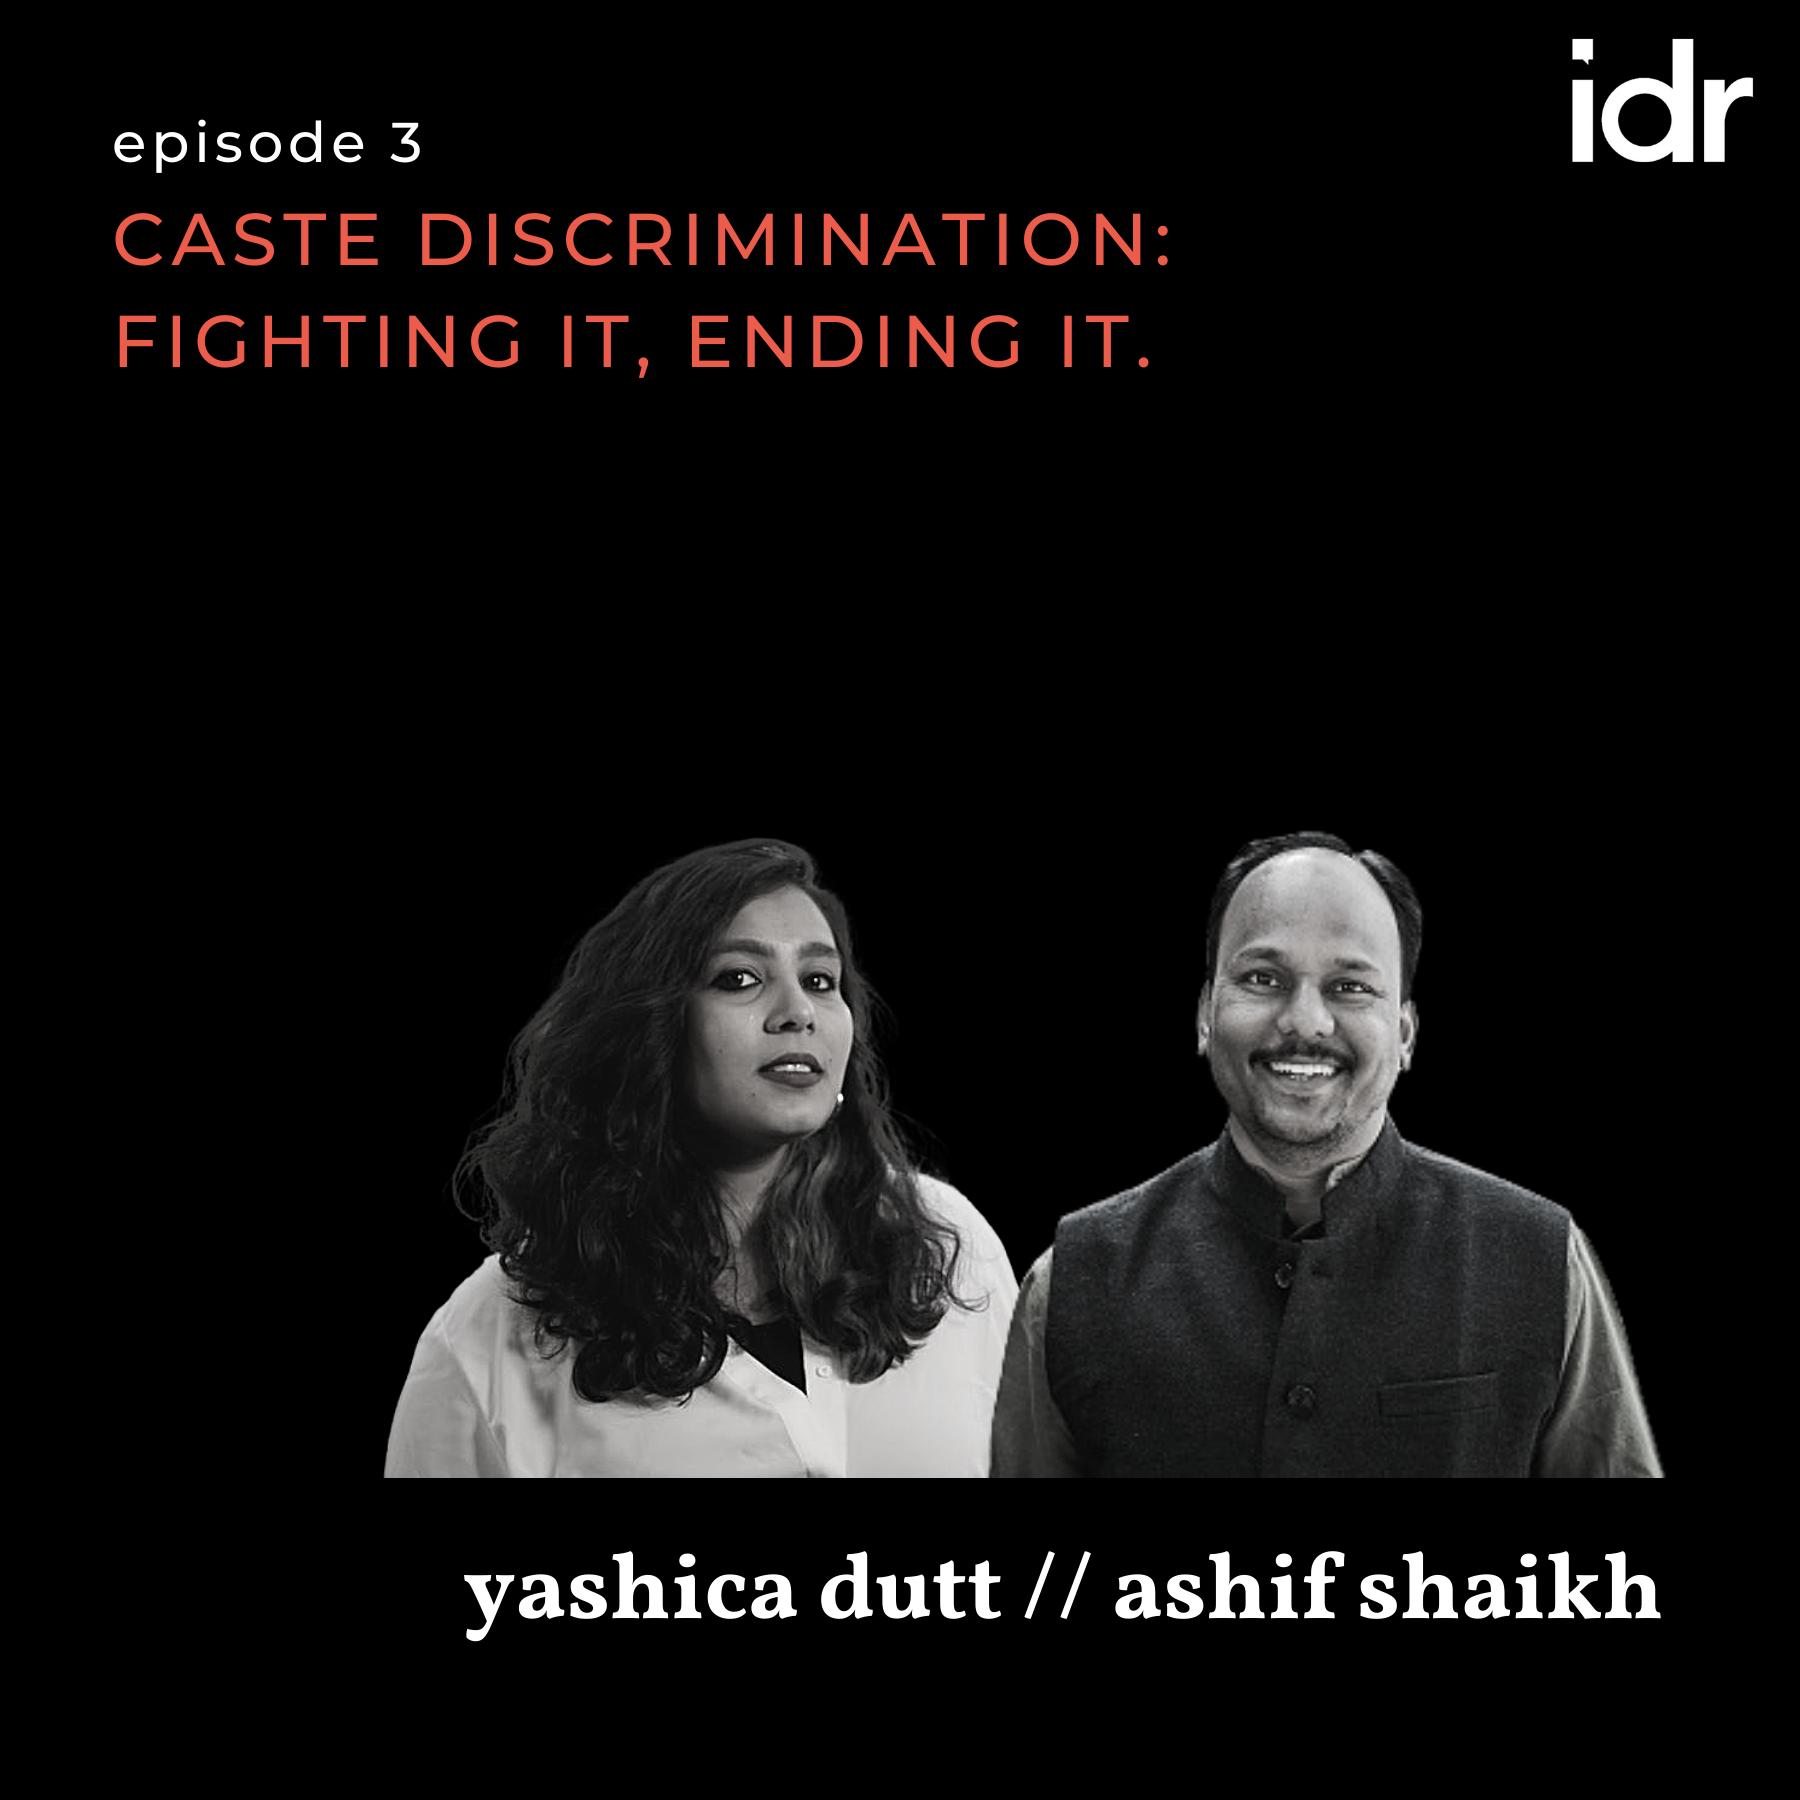 Caste discrimination: Fighting it, ending it